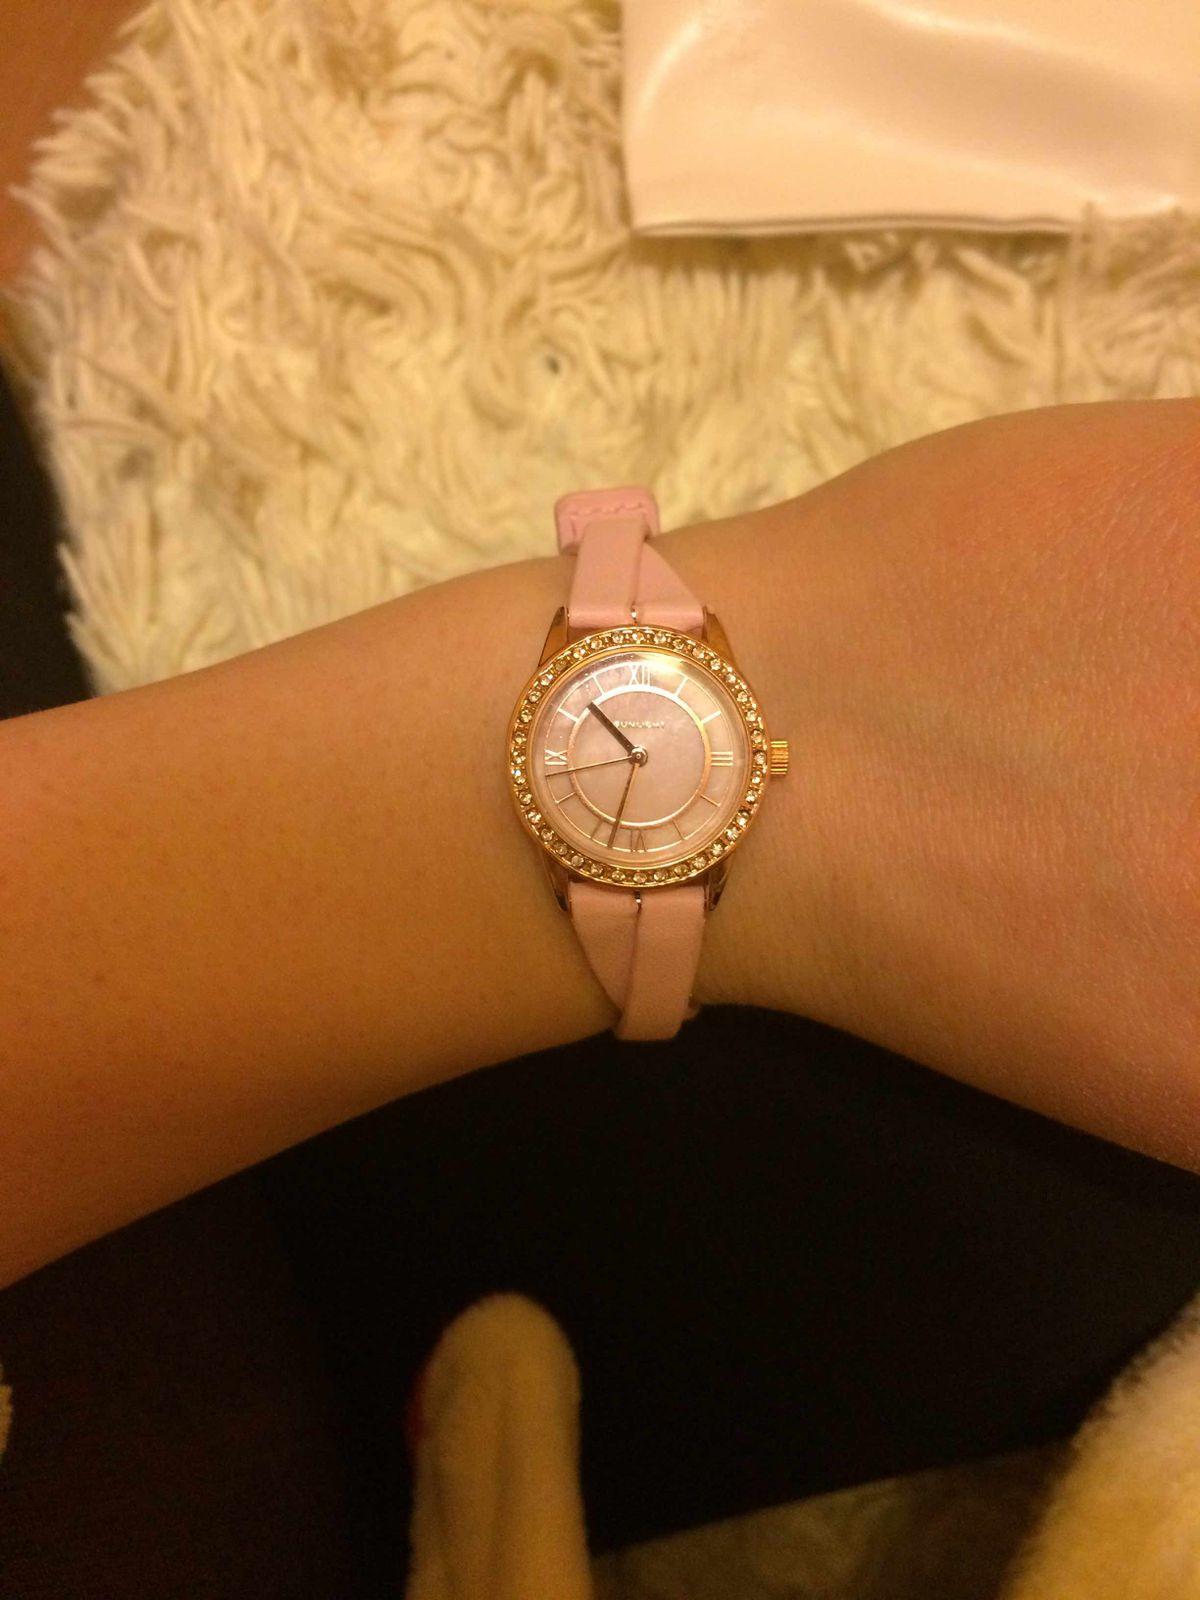 Замечательные часы на тонкую руку